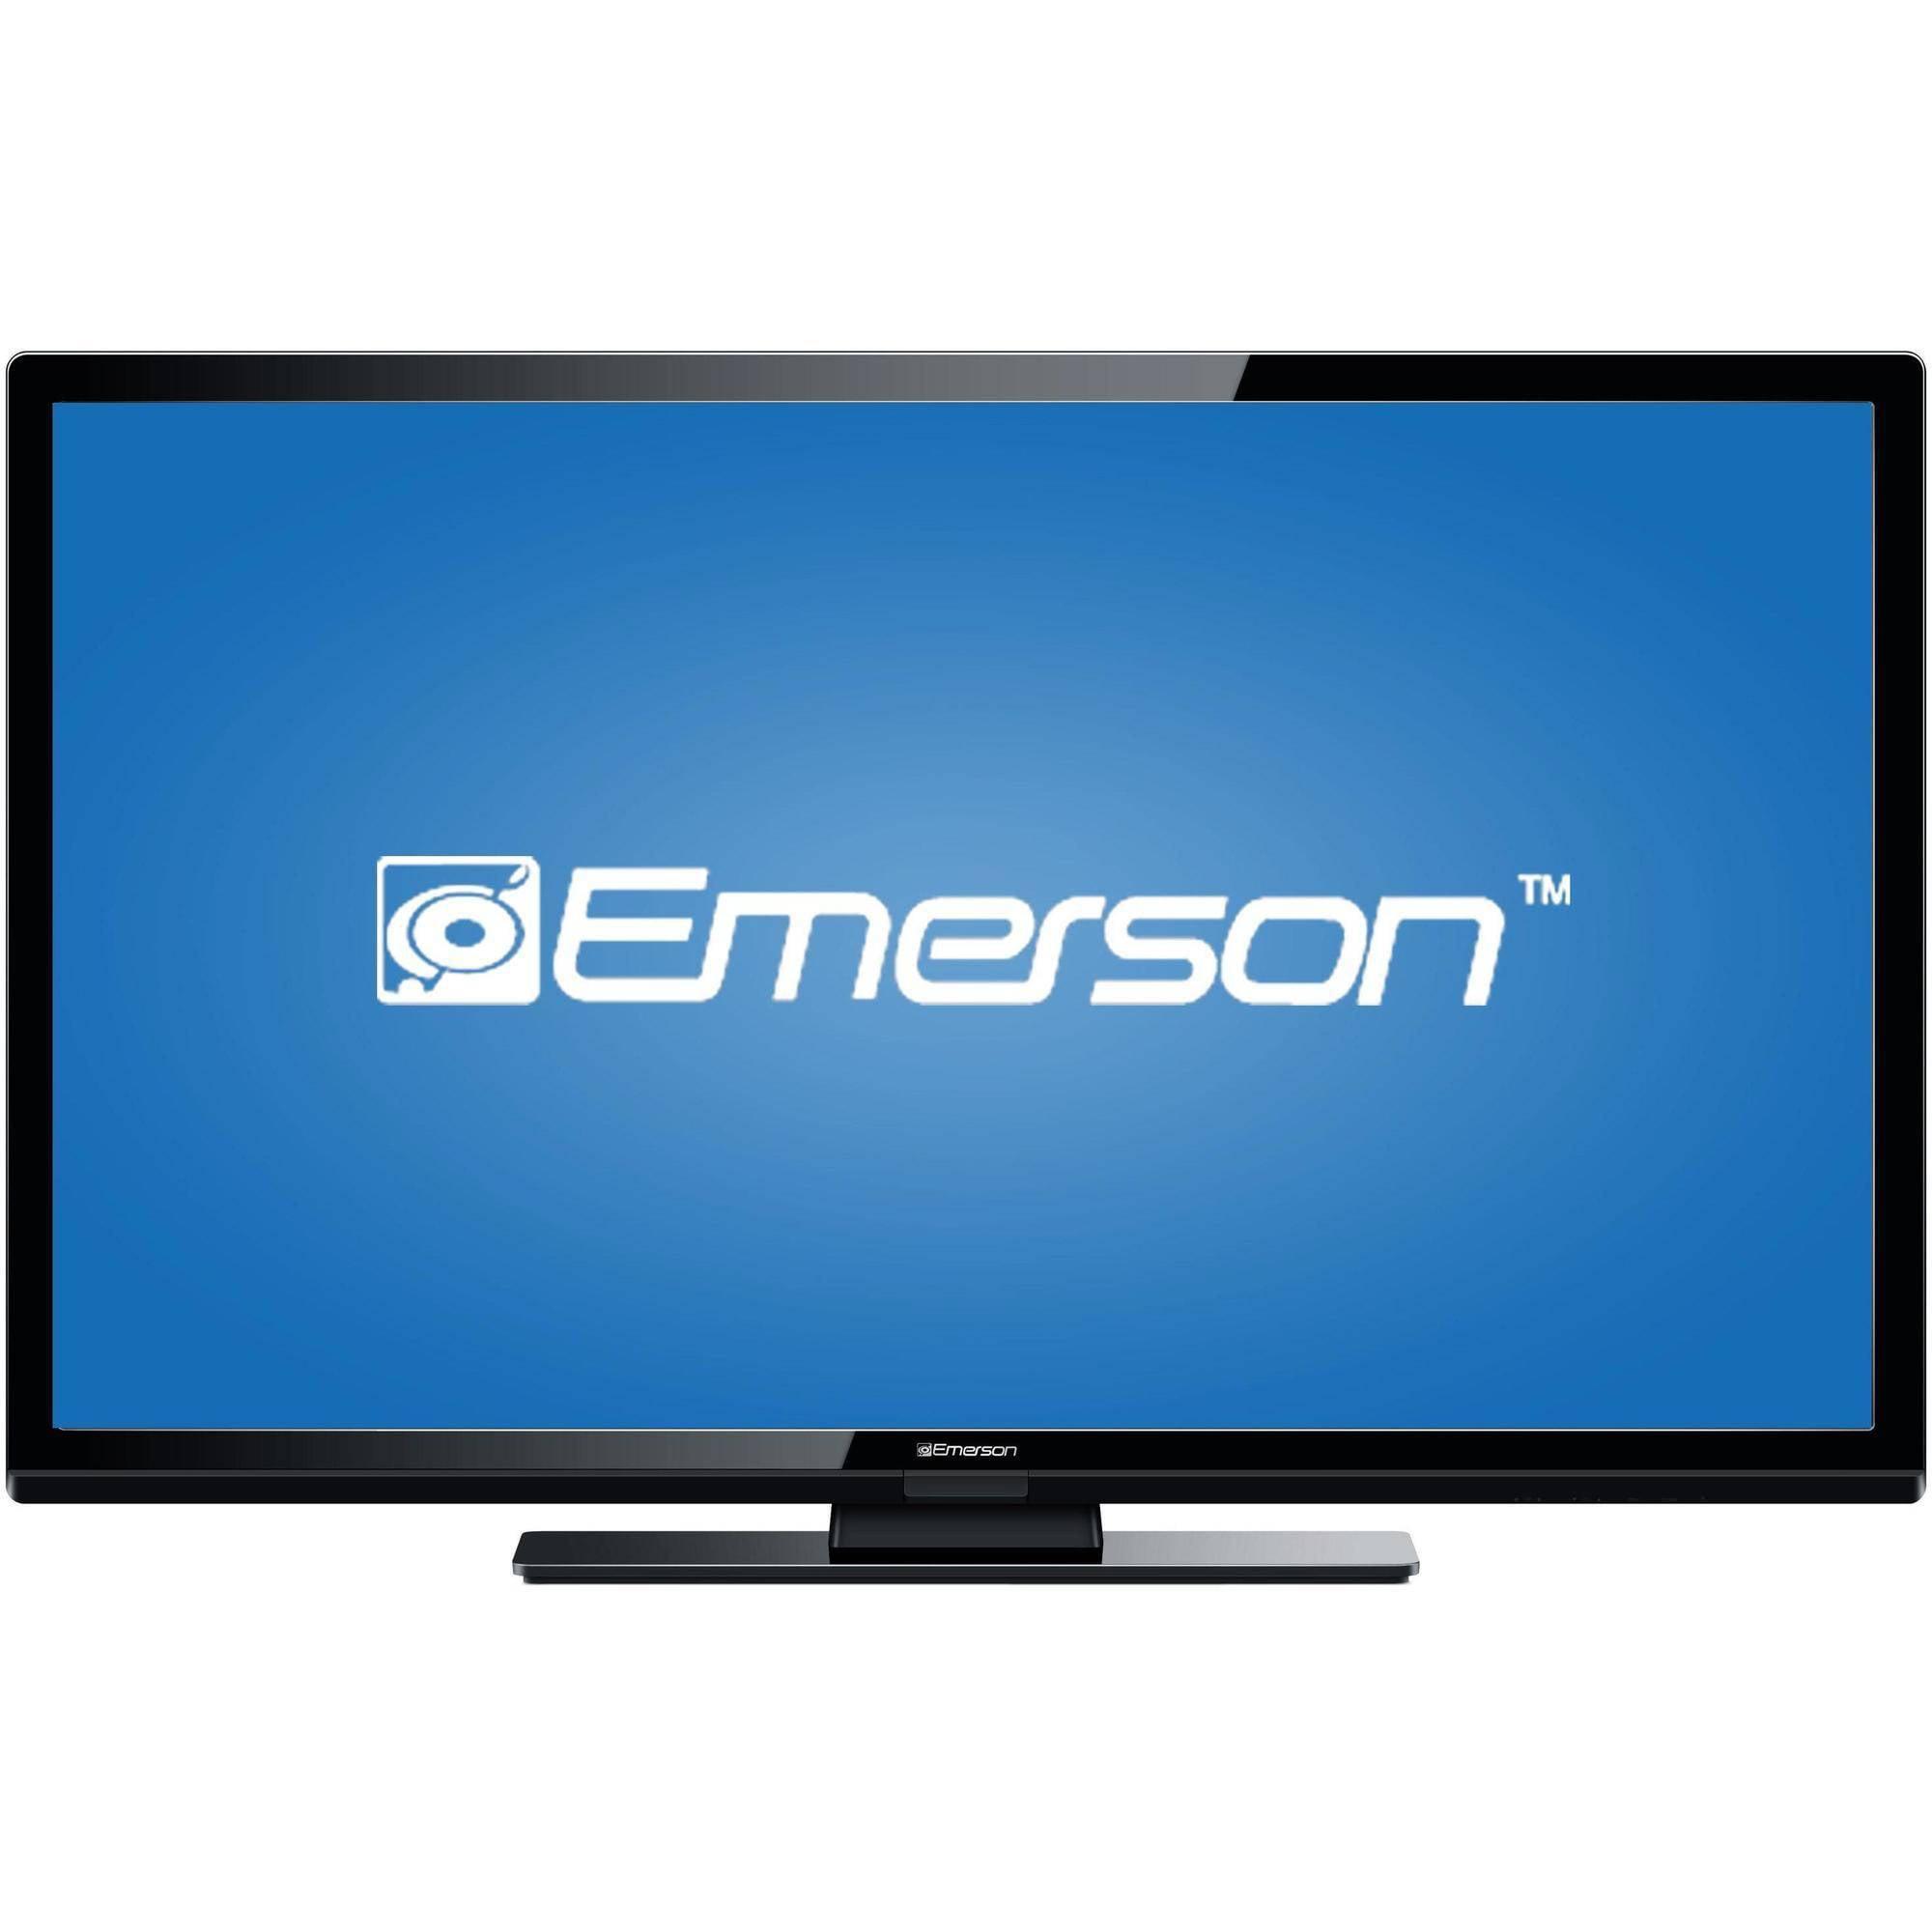 "Refurbished Emerson LF501EM6F 50"" 1080p 120Hz Class LED HDTV"